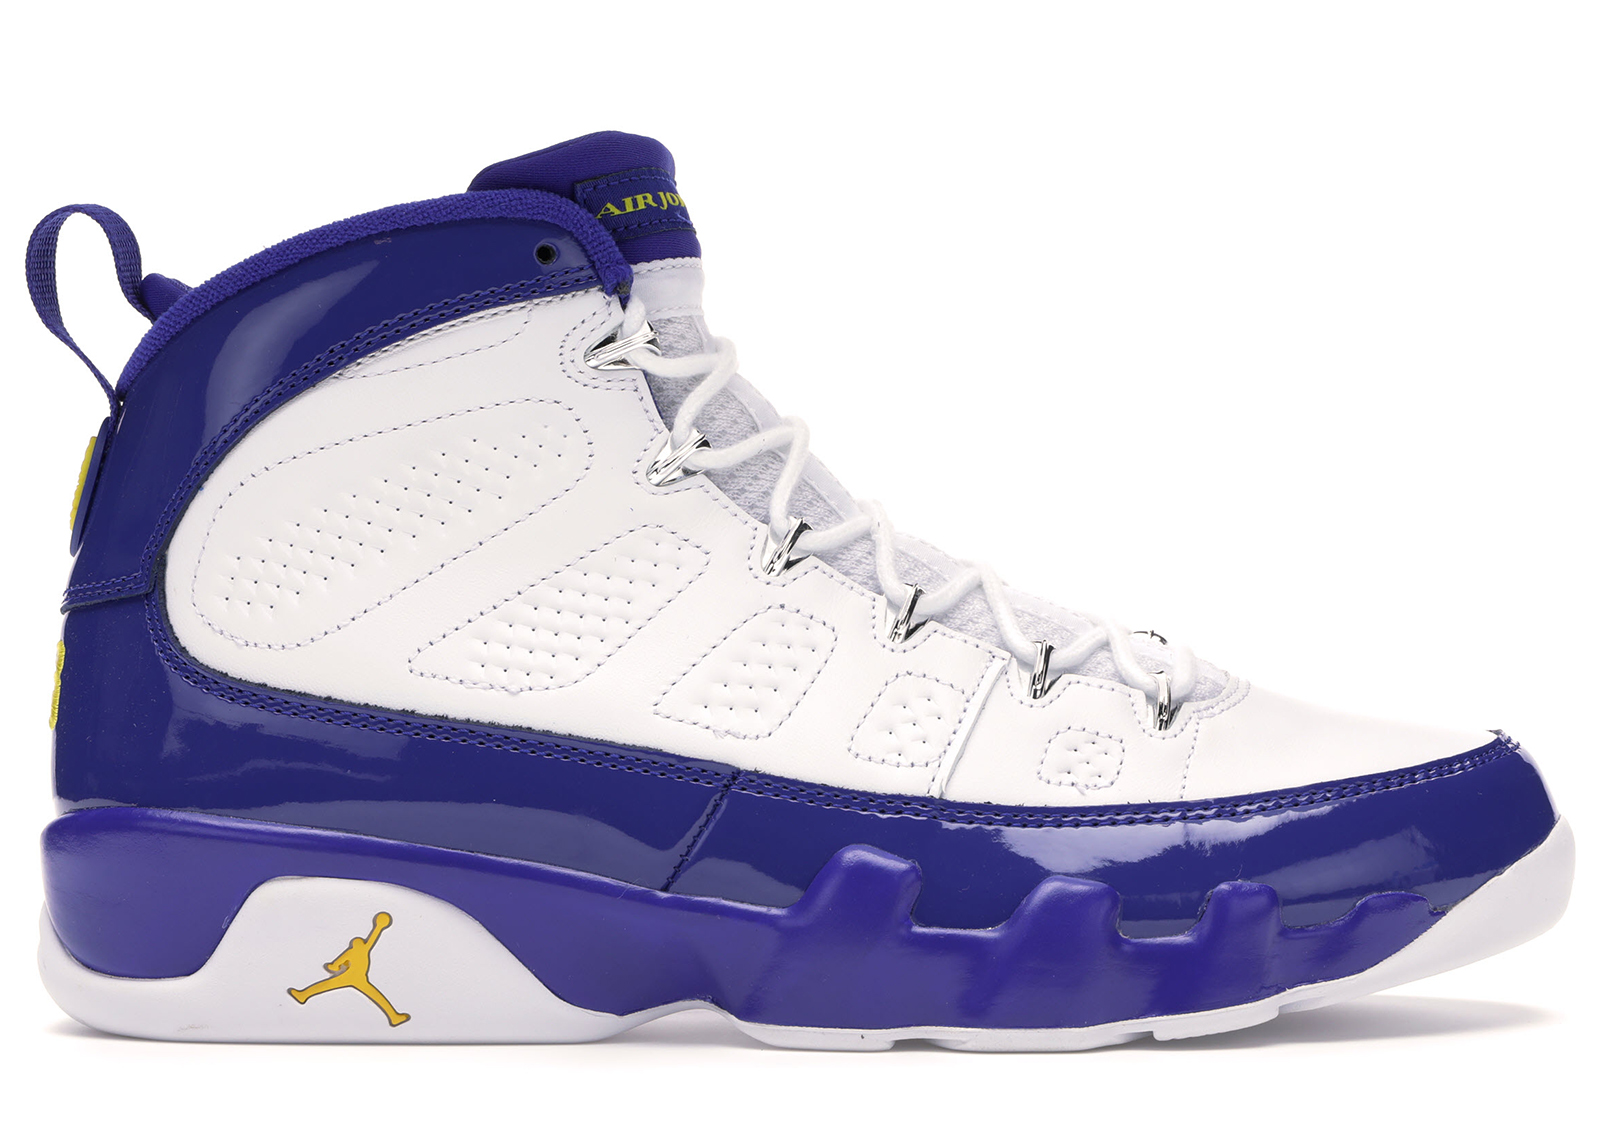 Jordan 9 Retro Kobe Bryant PE - 302370-121